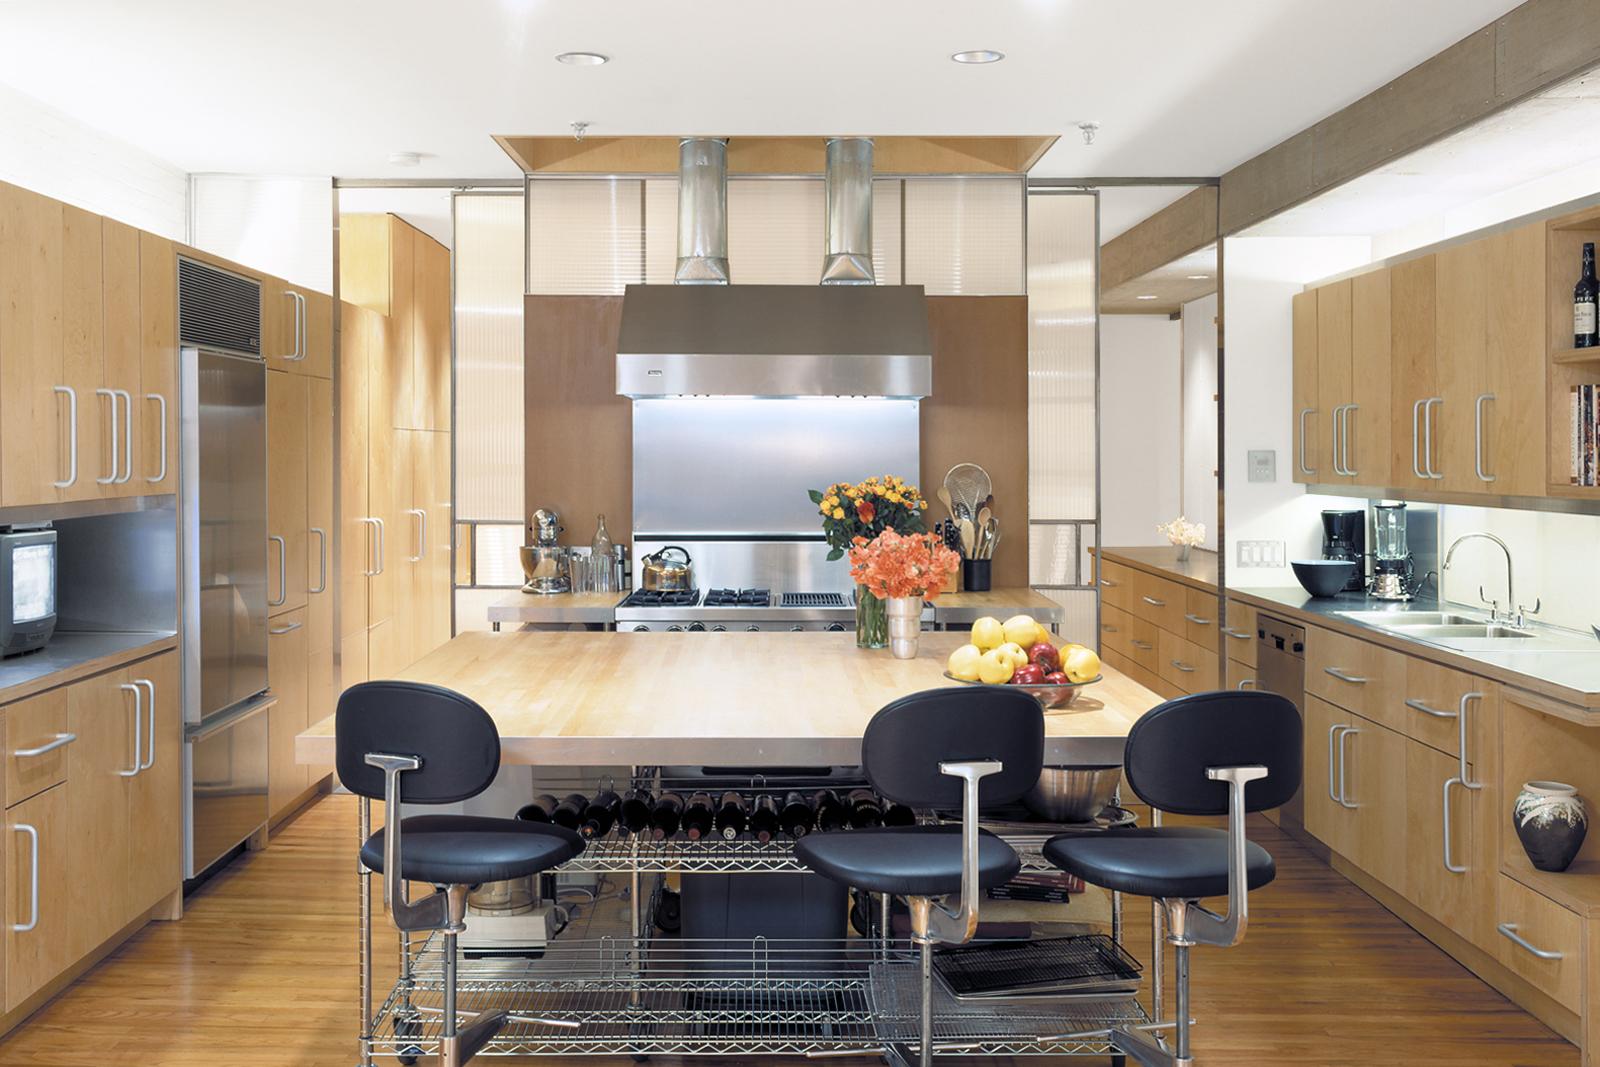 RES4 | Resolution: 4 Architecture | Ron\'s Loft | Modern ...